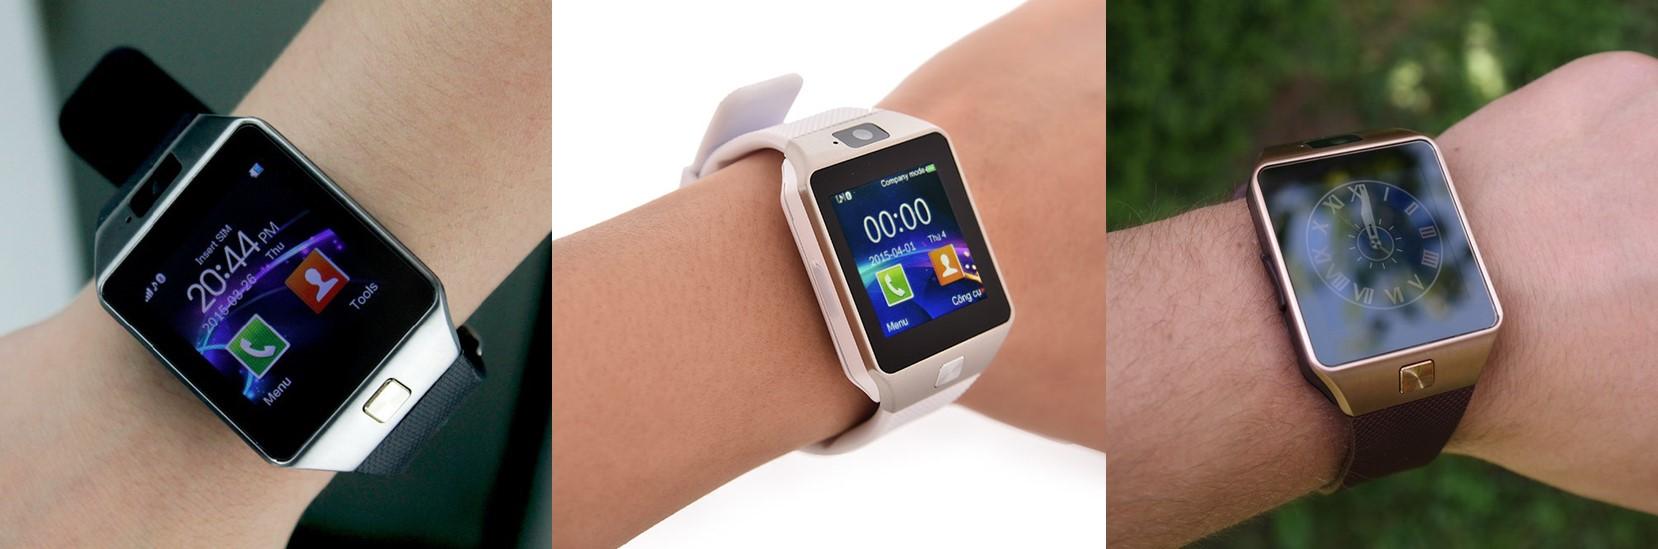 smart-watch-dz09_hands.jpg